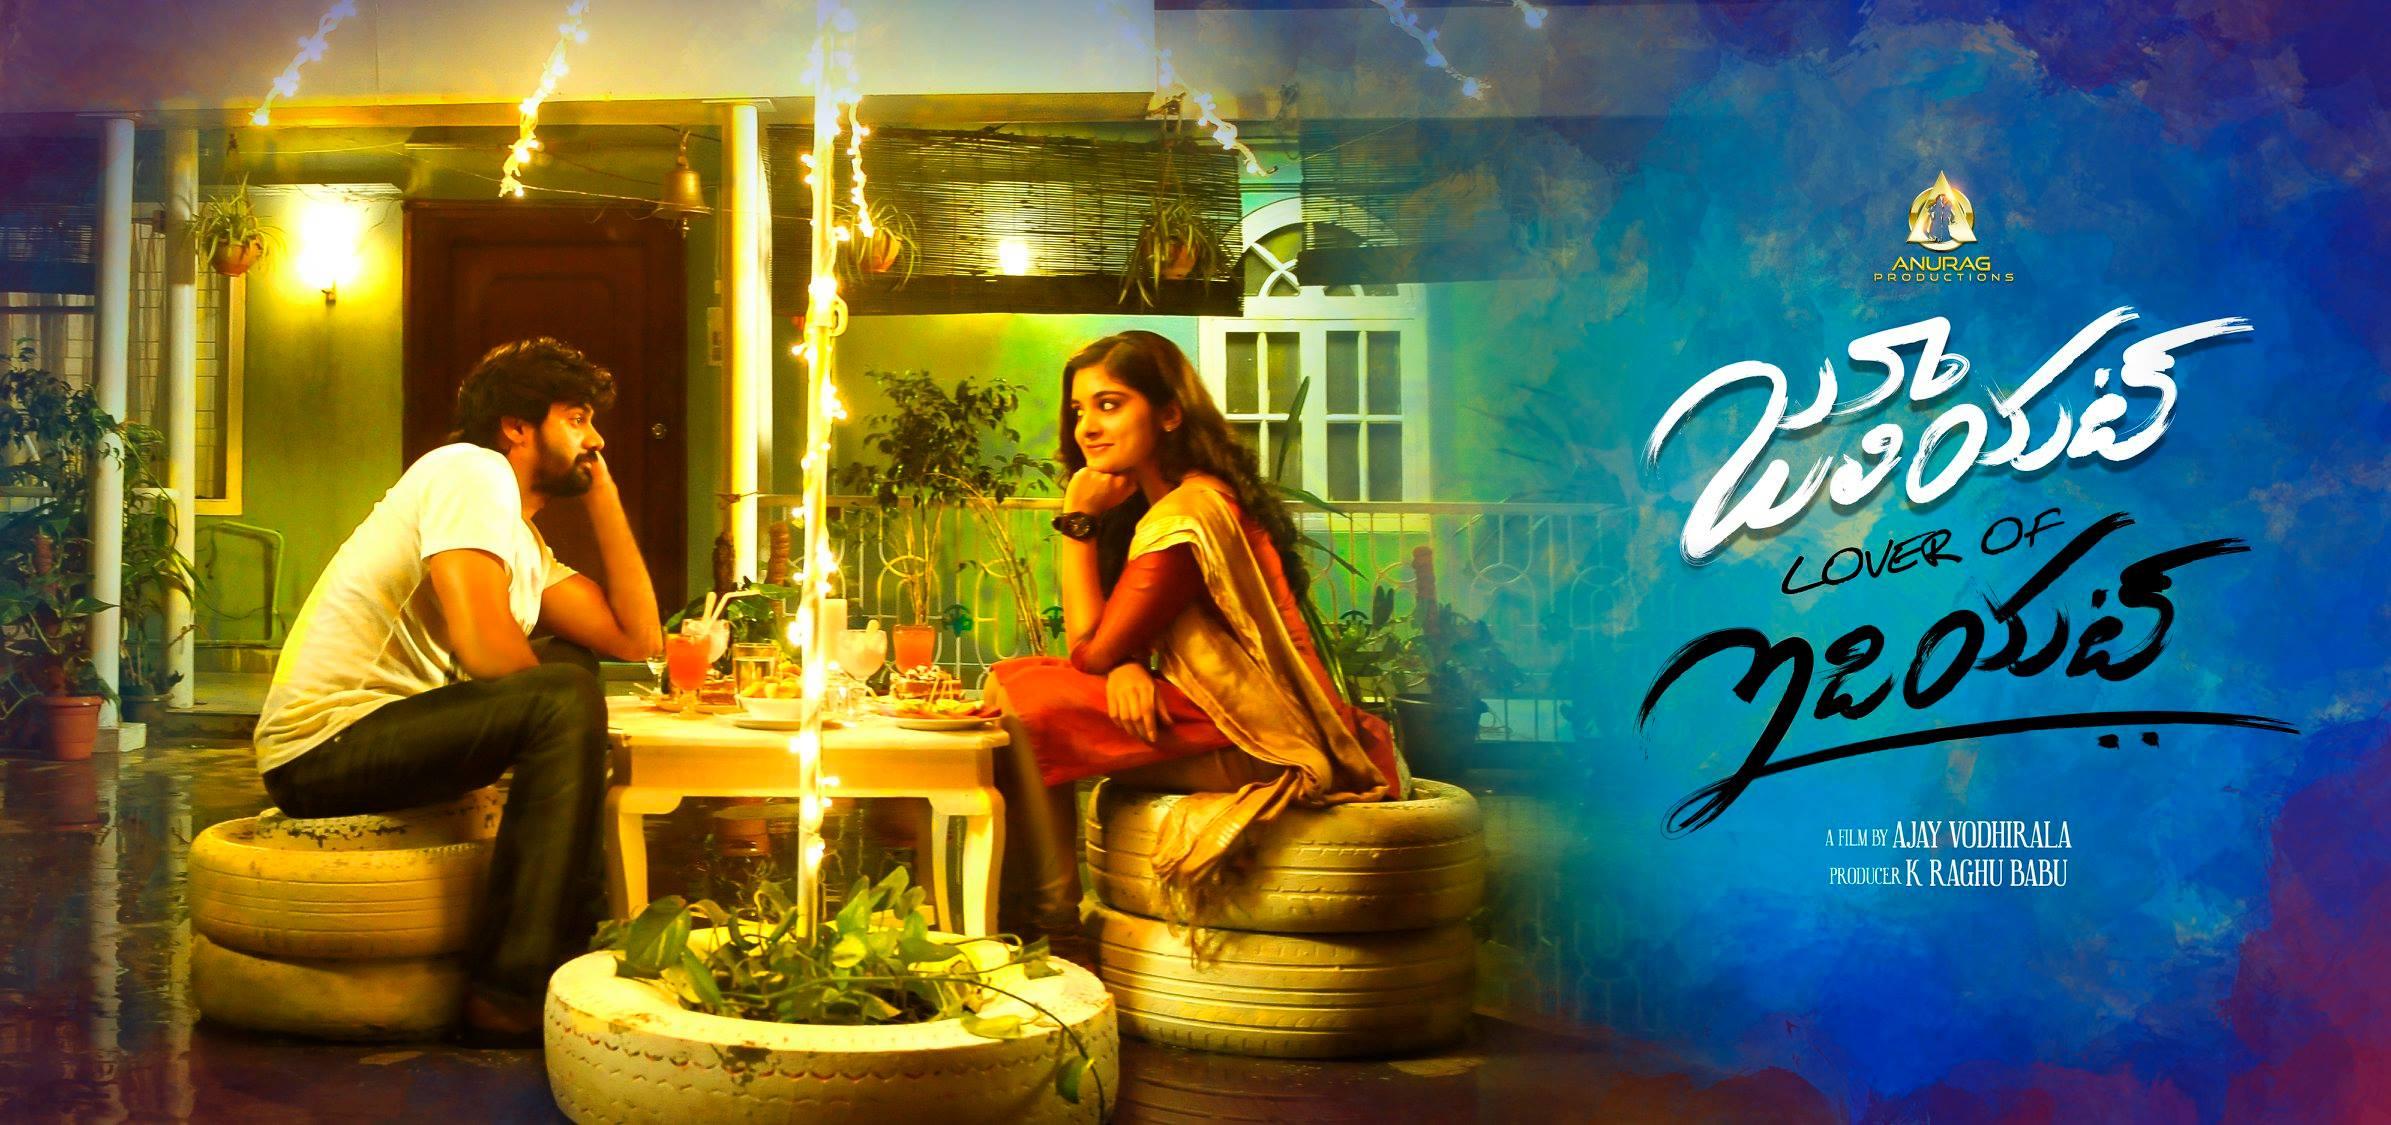 Juliet Lover Of Idiot (2017) DVDScr Telugu Full Movie Watch Online Free